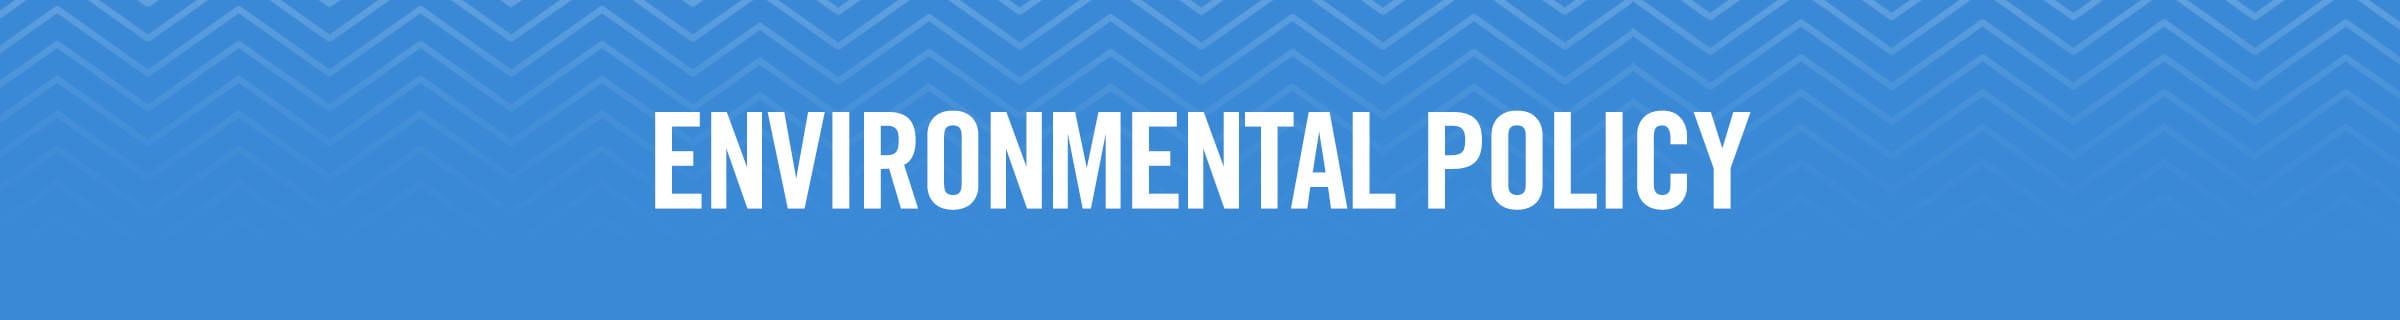 McCormick & Company Environmental Policy